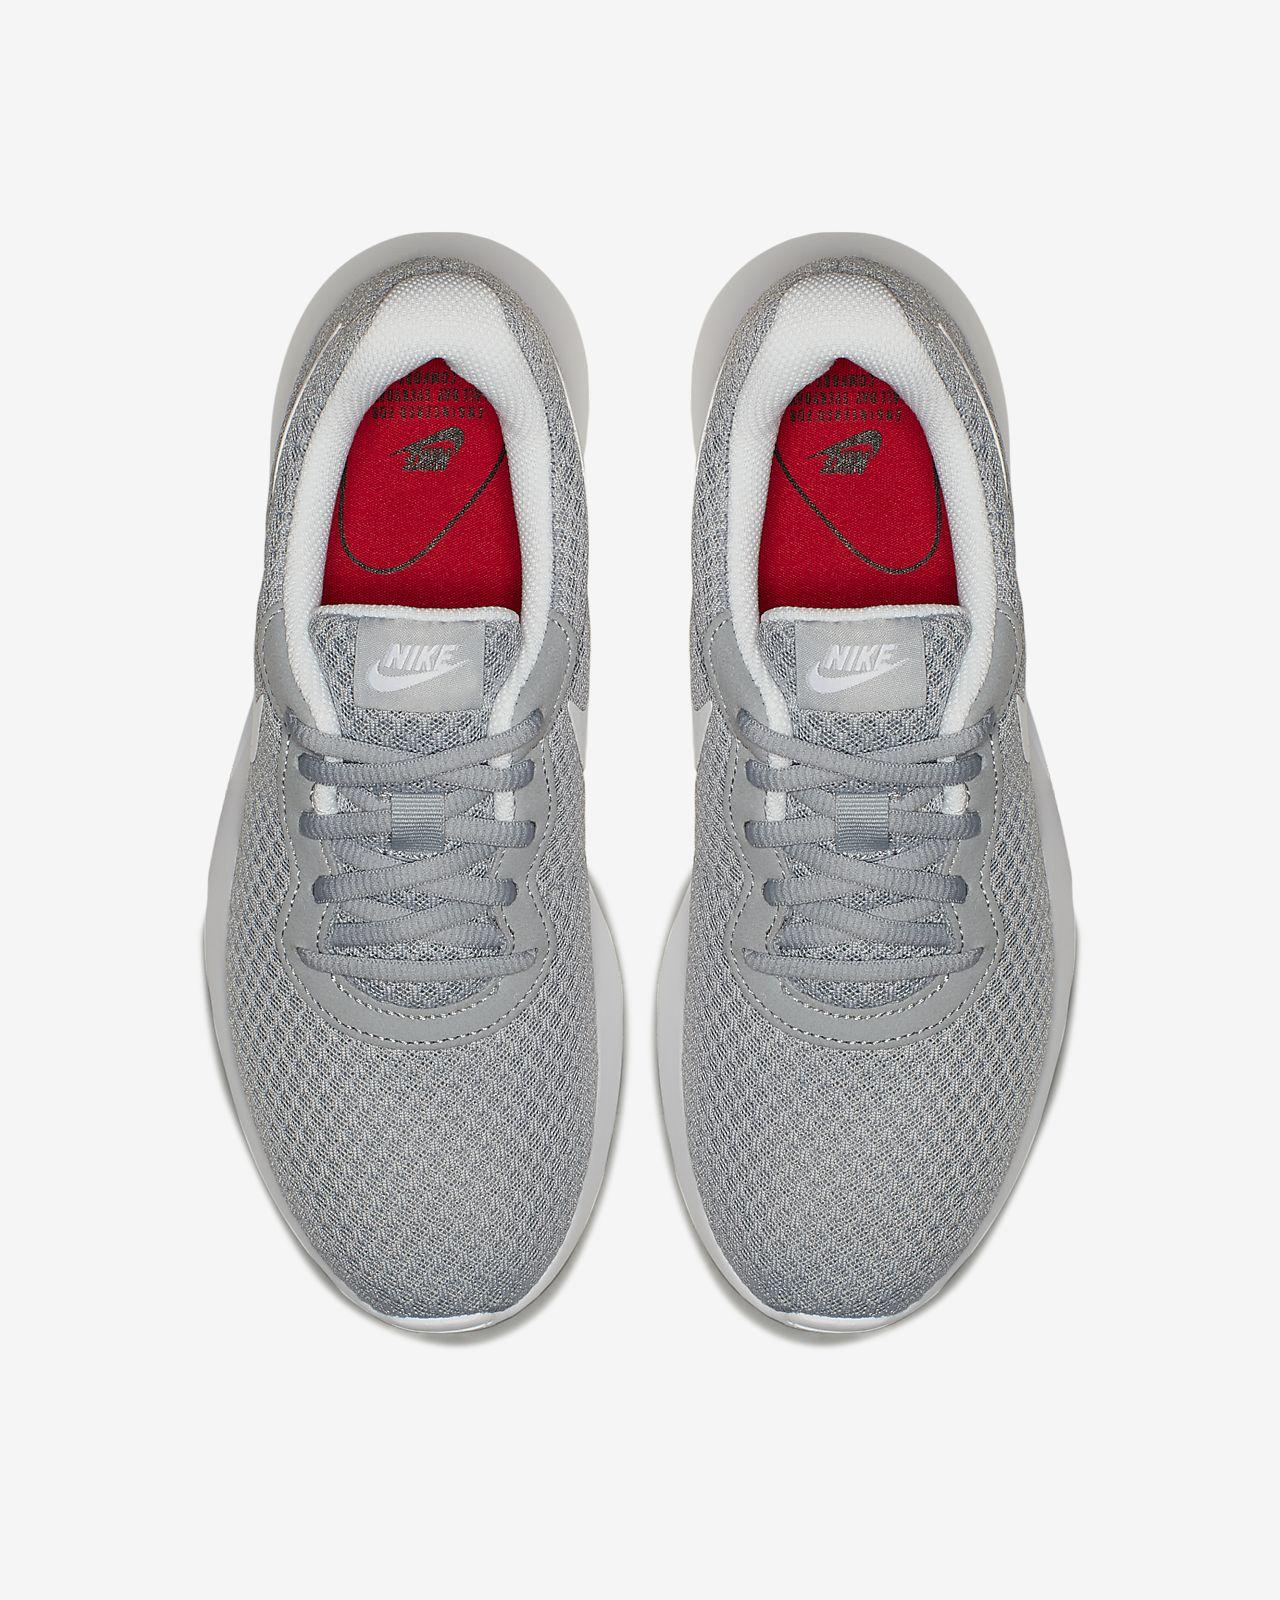 6bb0c2b41fcf Low Resolution Nike Tanjun Women s Shoe Nike Tanjun Women s Shoe